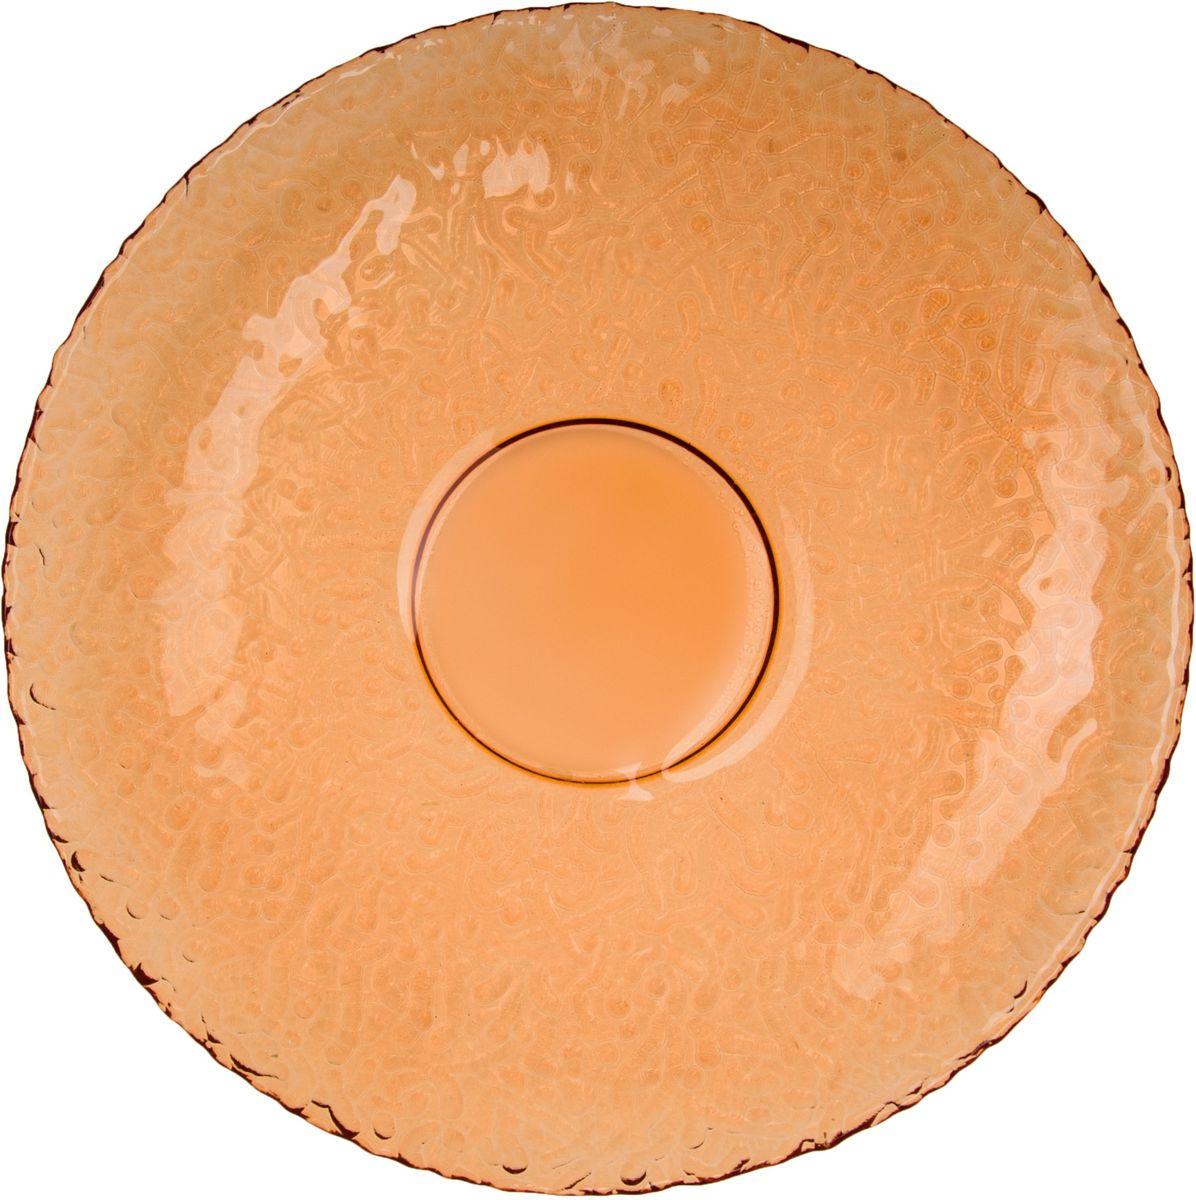 Тарелка Elff Decor Терра, цвет: оранжевый, диаметр 26 см тарелка 20 см elff decor цвет синий голубой белый